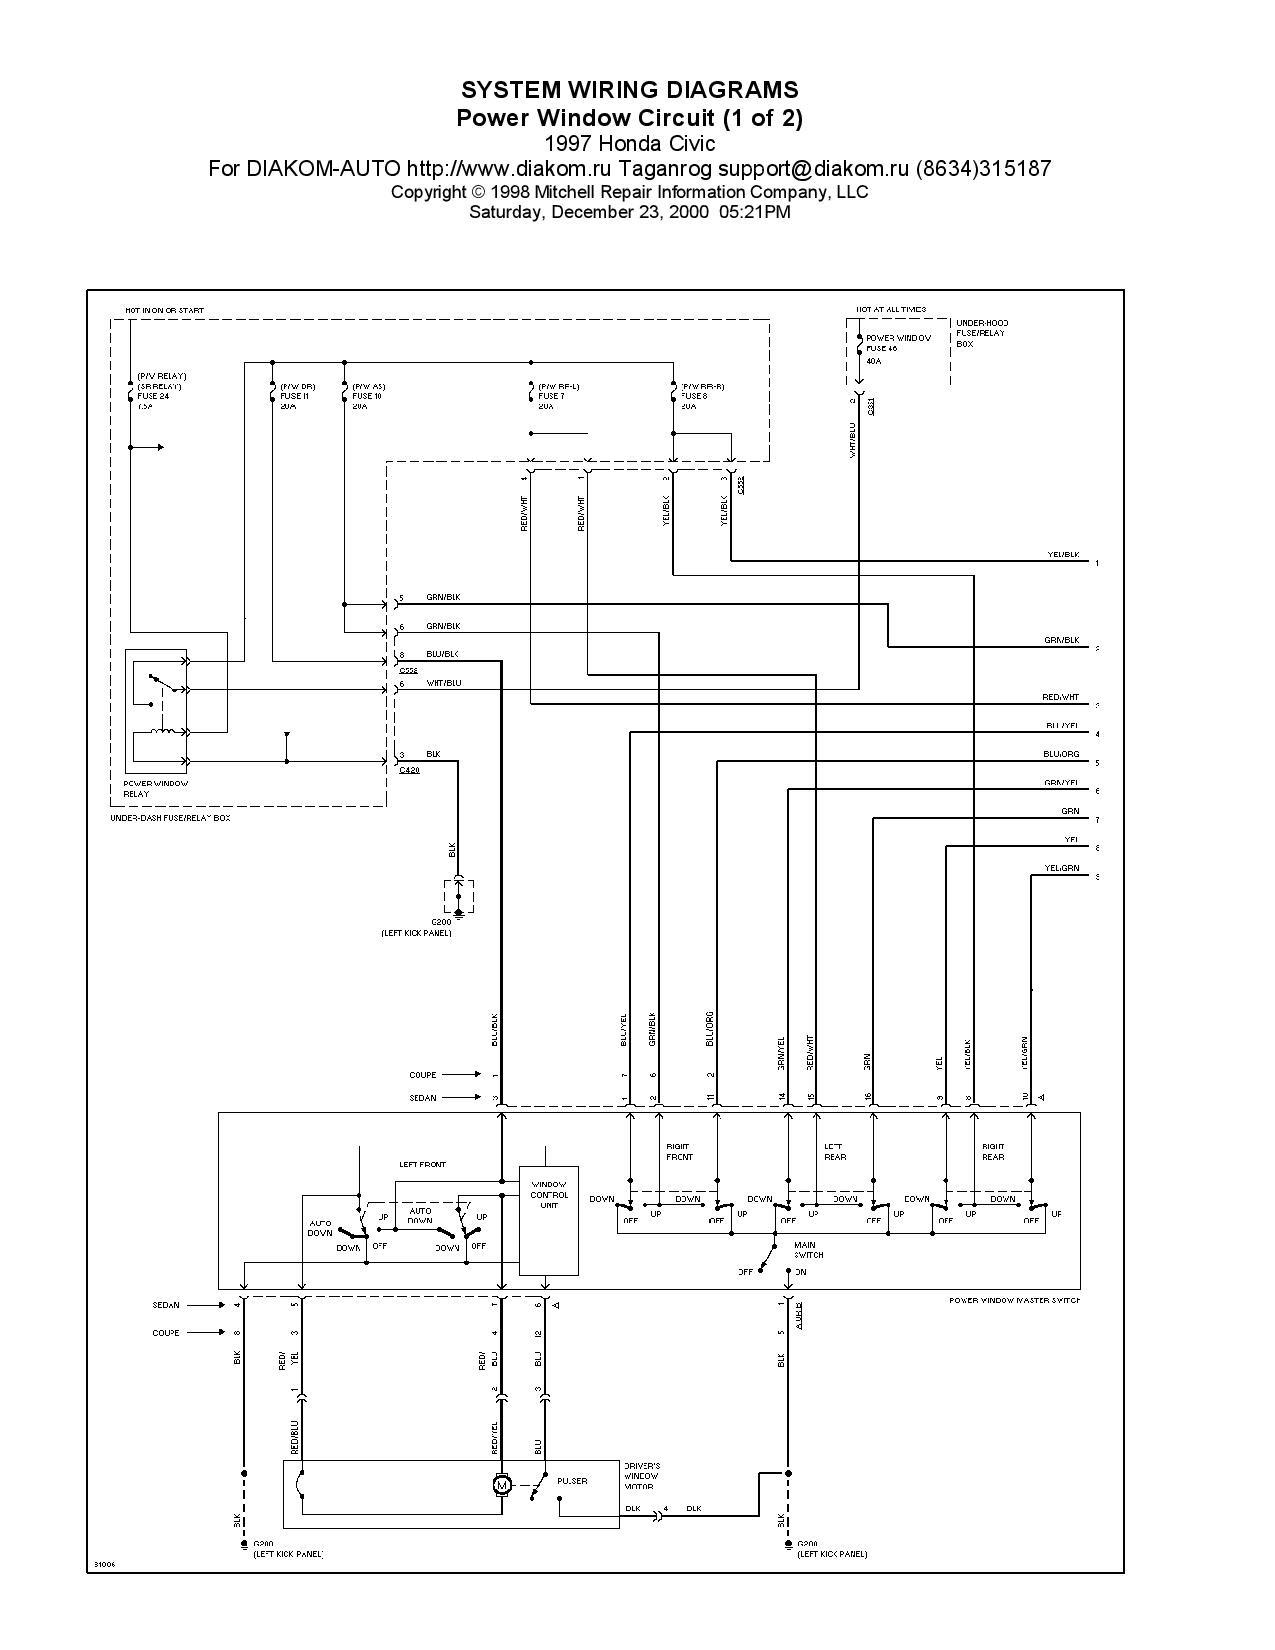 power window wiring diagram honda civic - home wiring diagram  home wiring diagram